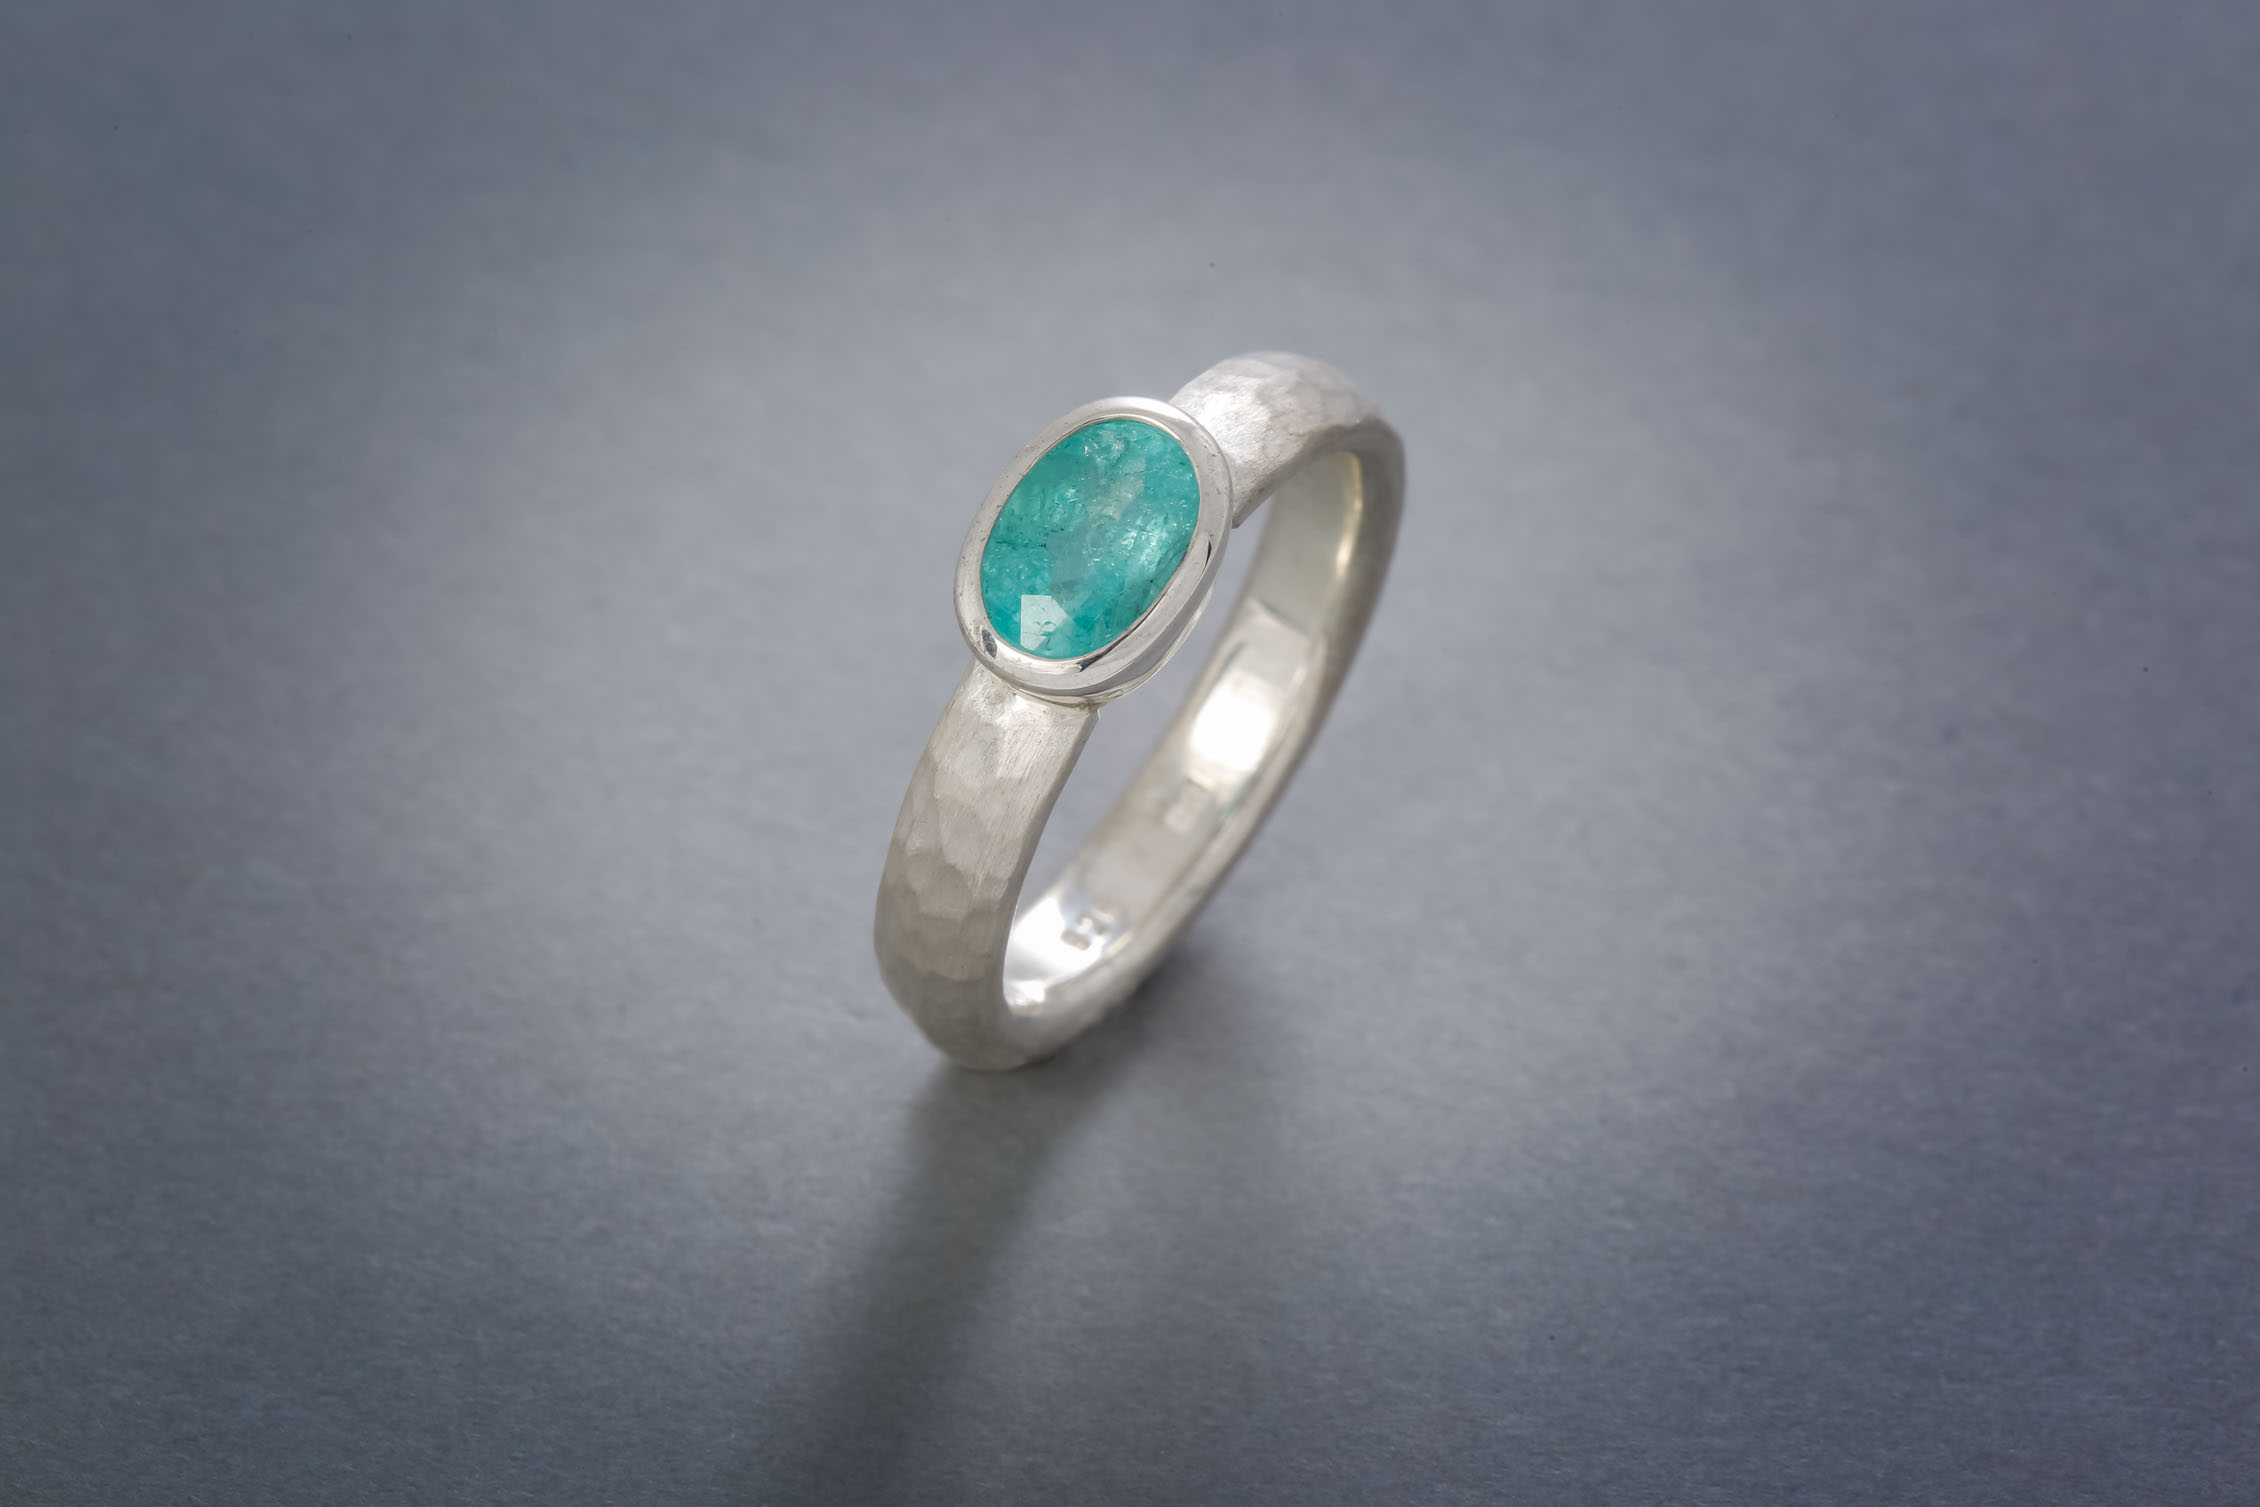 001 Silberring, Paraiba-Turmalin ab € 578,-